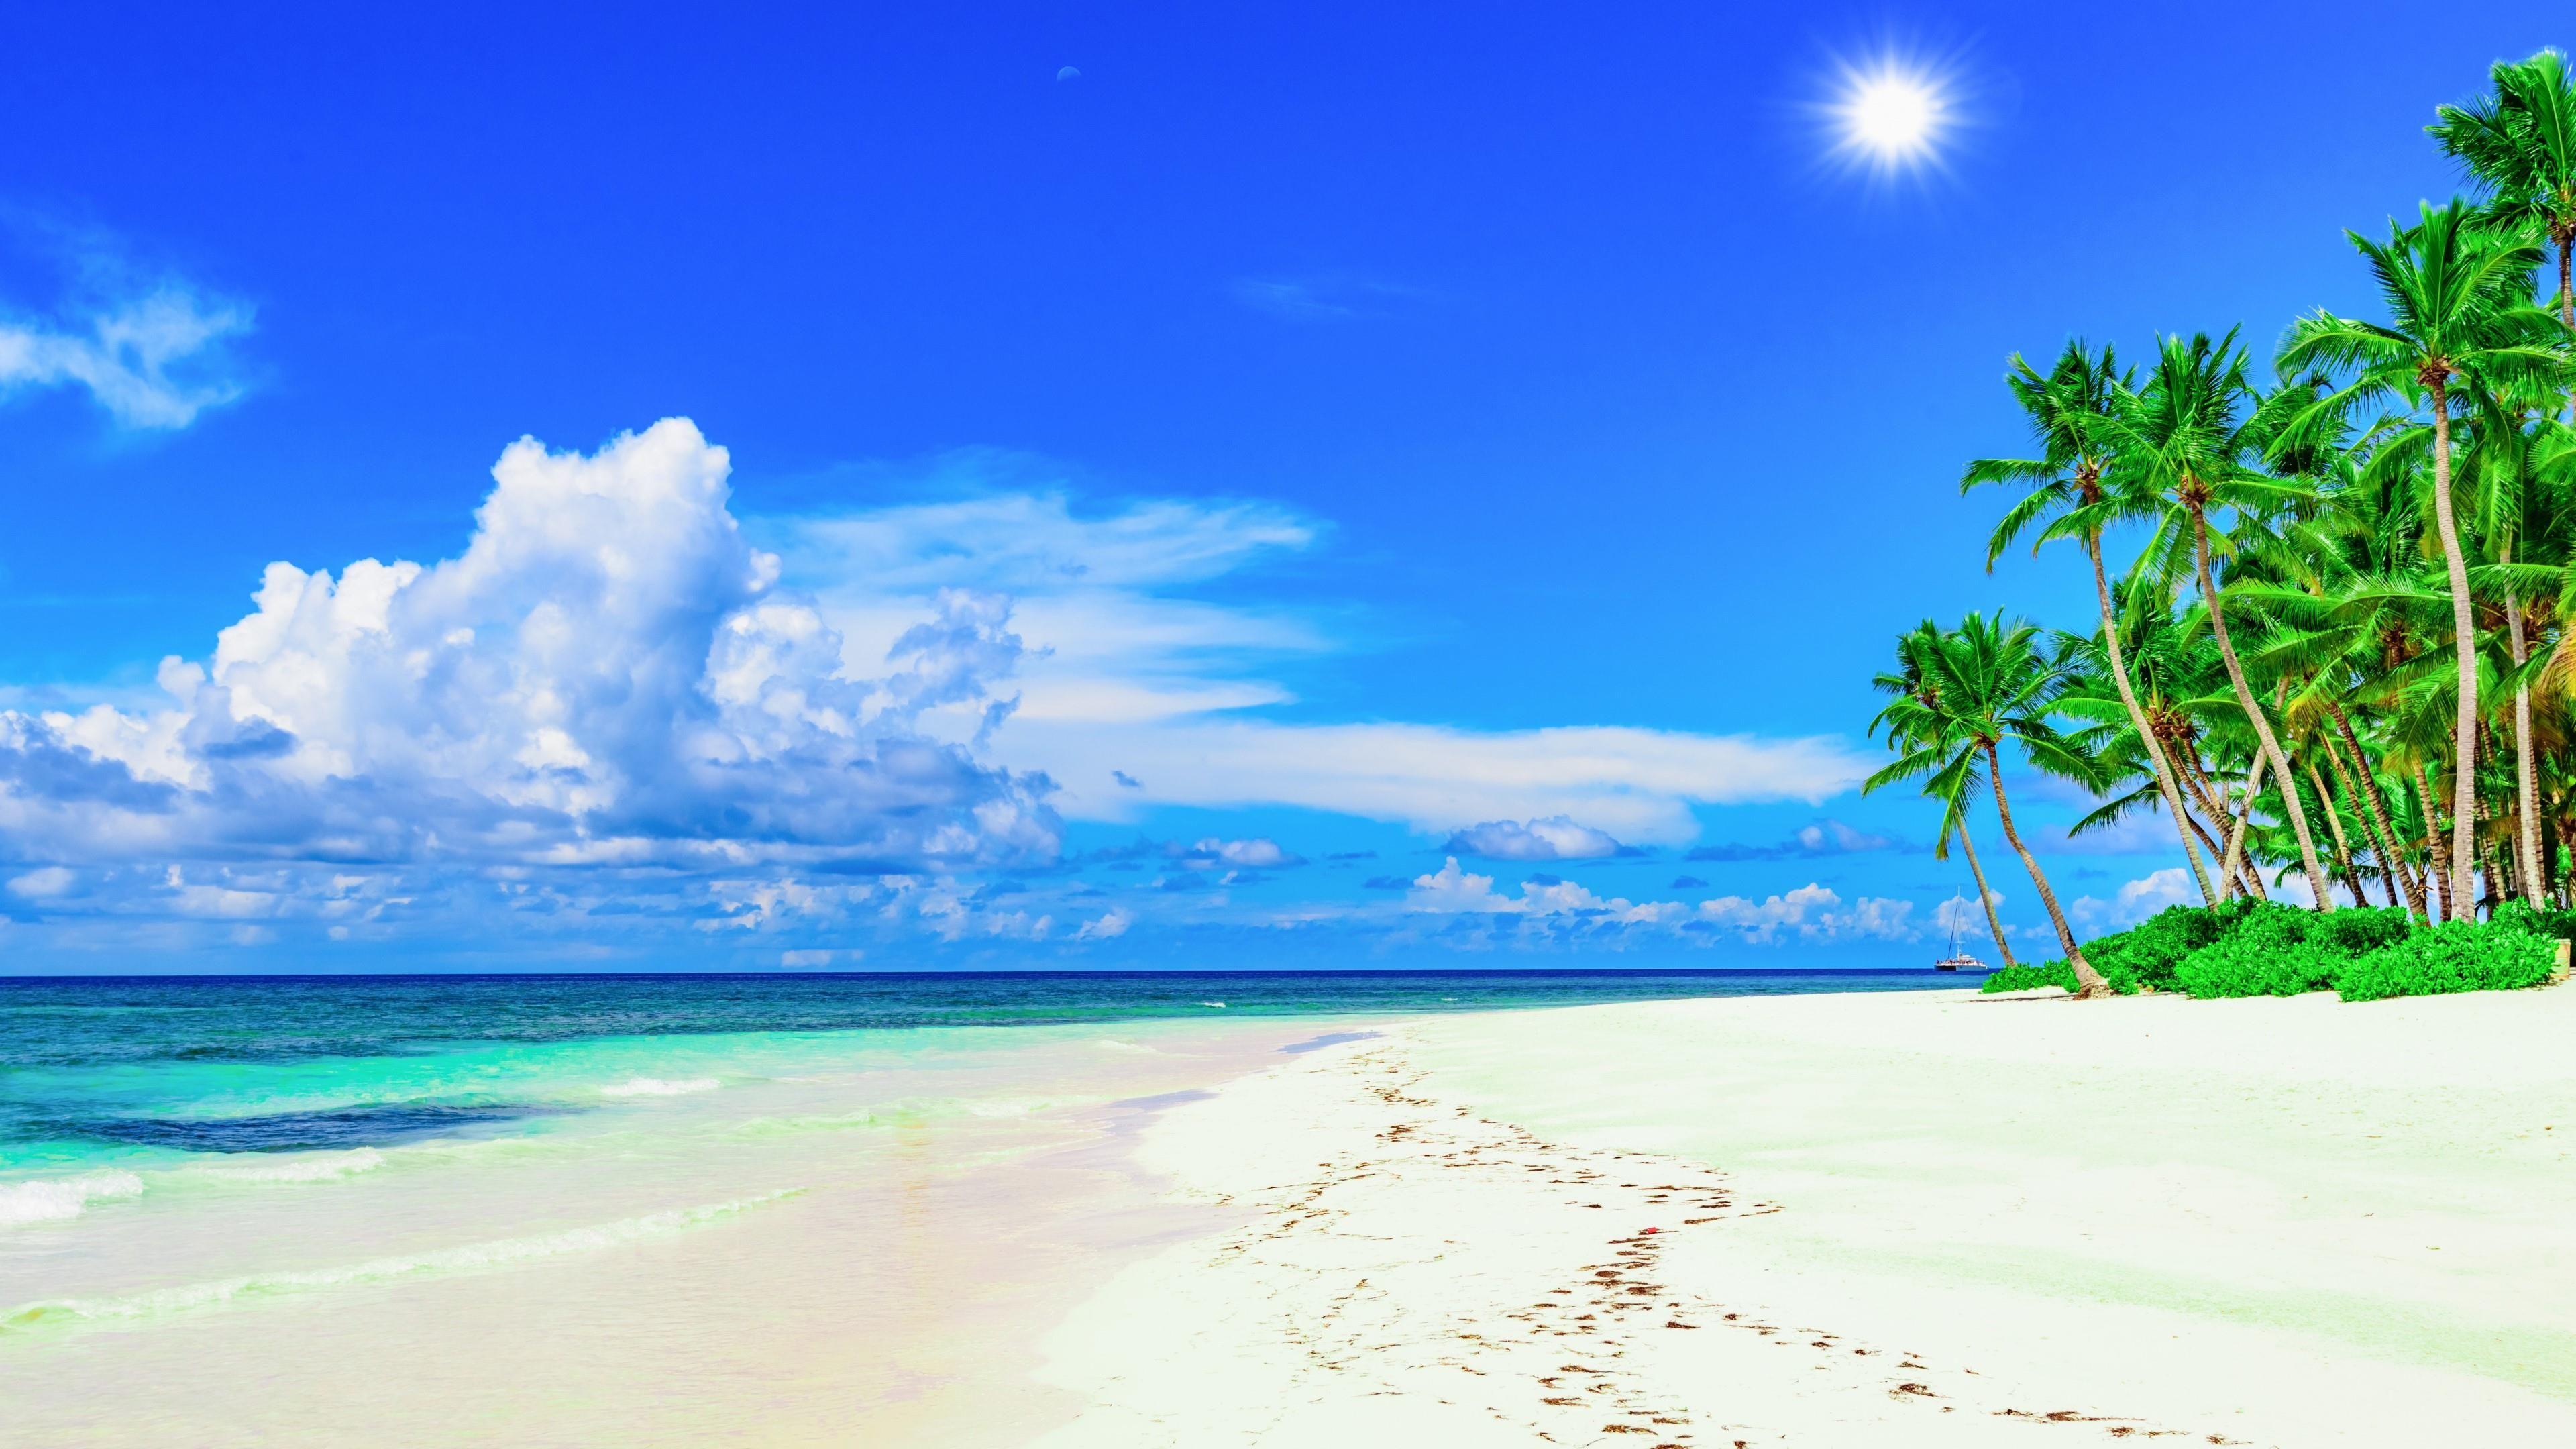 Find Out Sunny Beach Wallpaper Hd As Wallpaper Hd On Sotoak Com Iphone Android Wallpaper Sunn Beach Wallpaper Beach Pictures Wallpaper Landscape Wallpaper